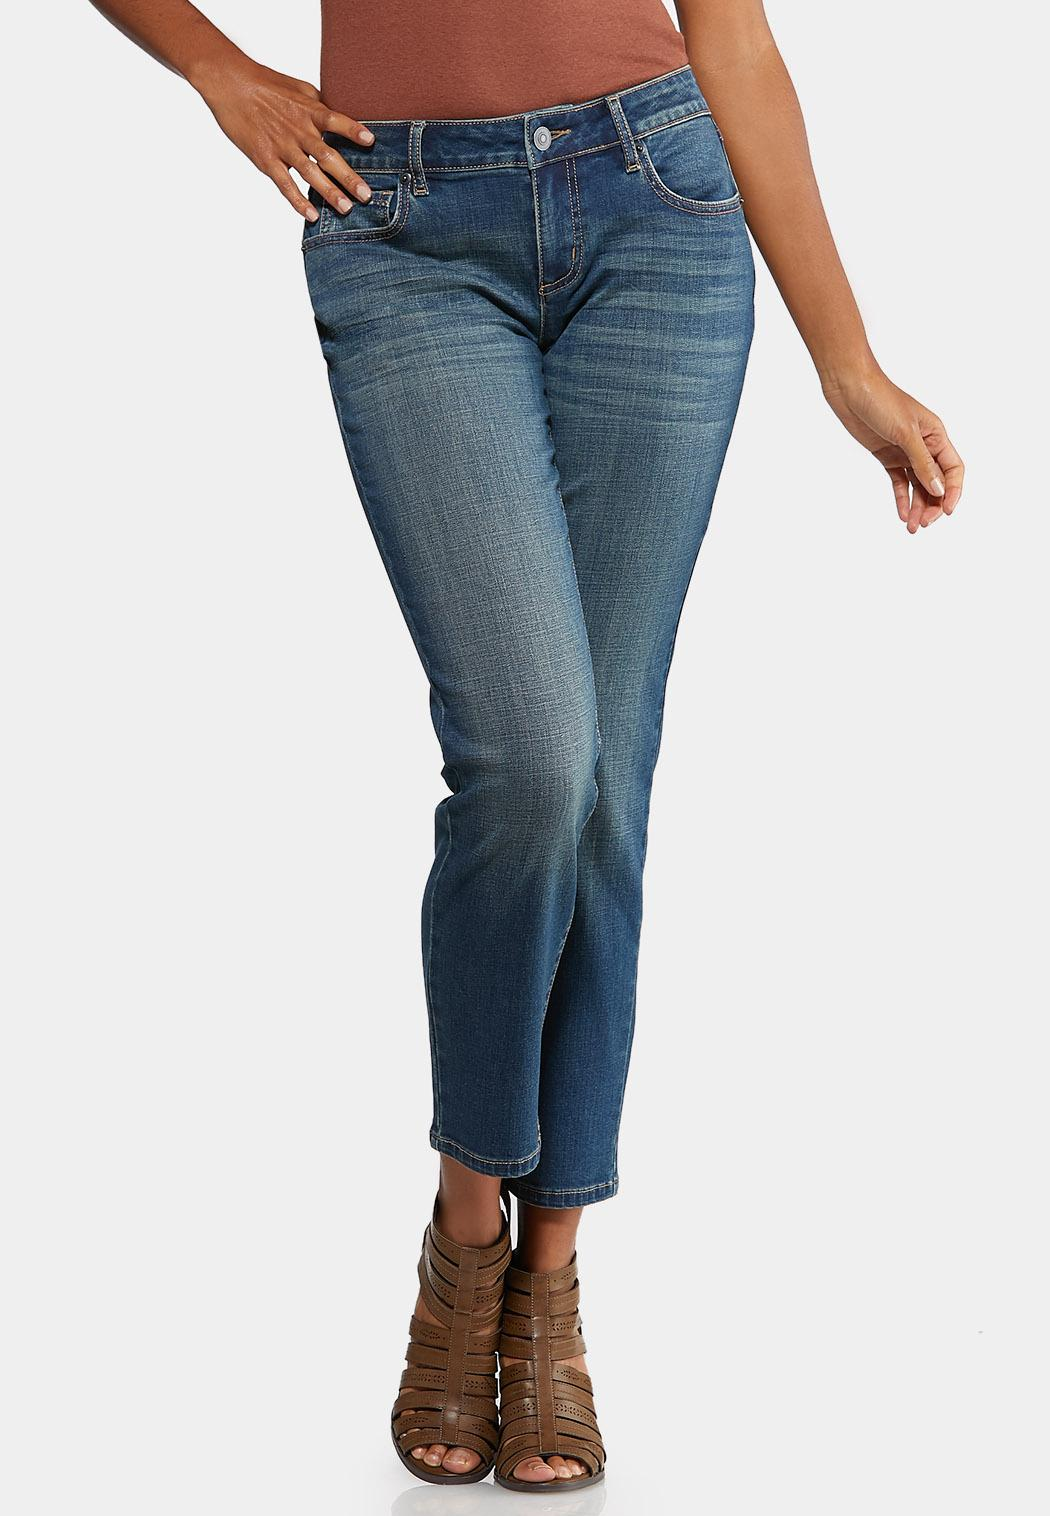 Girlfriend Ankle Jeans